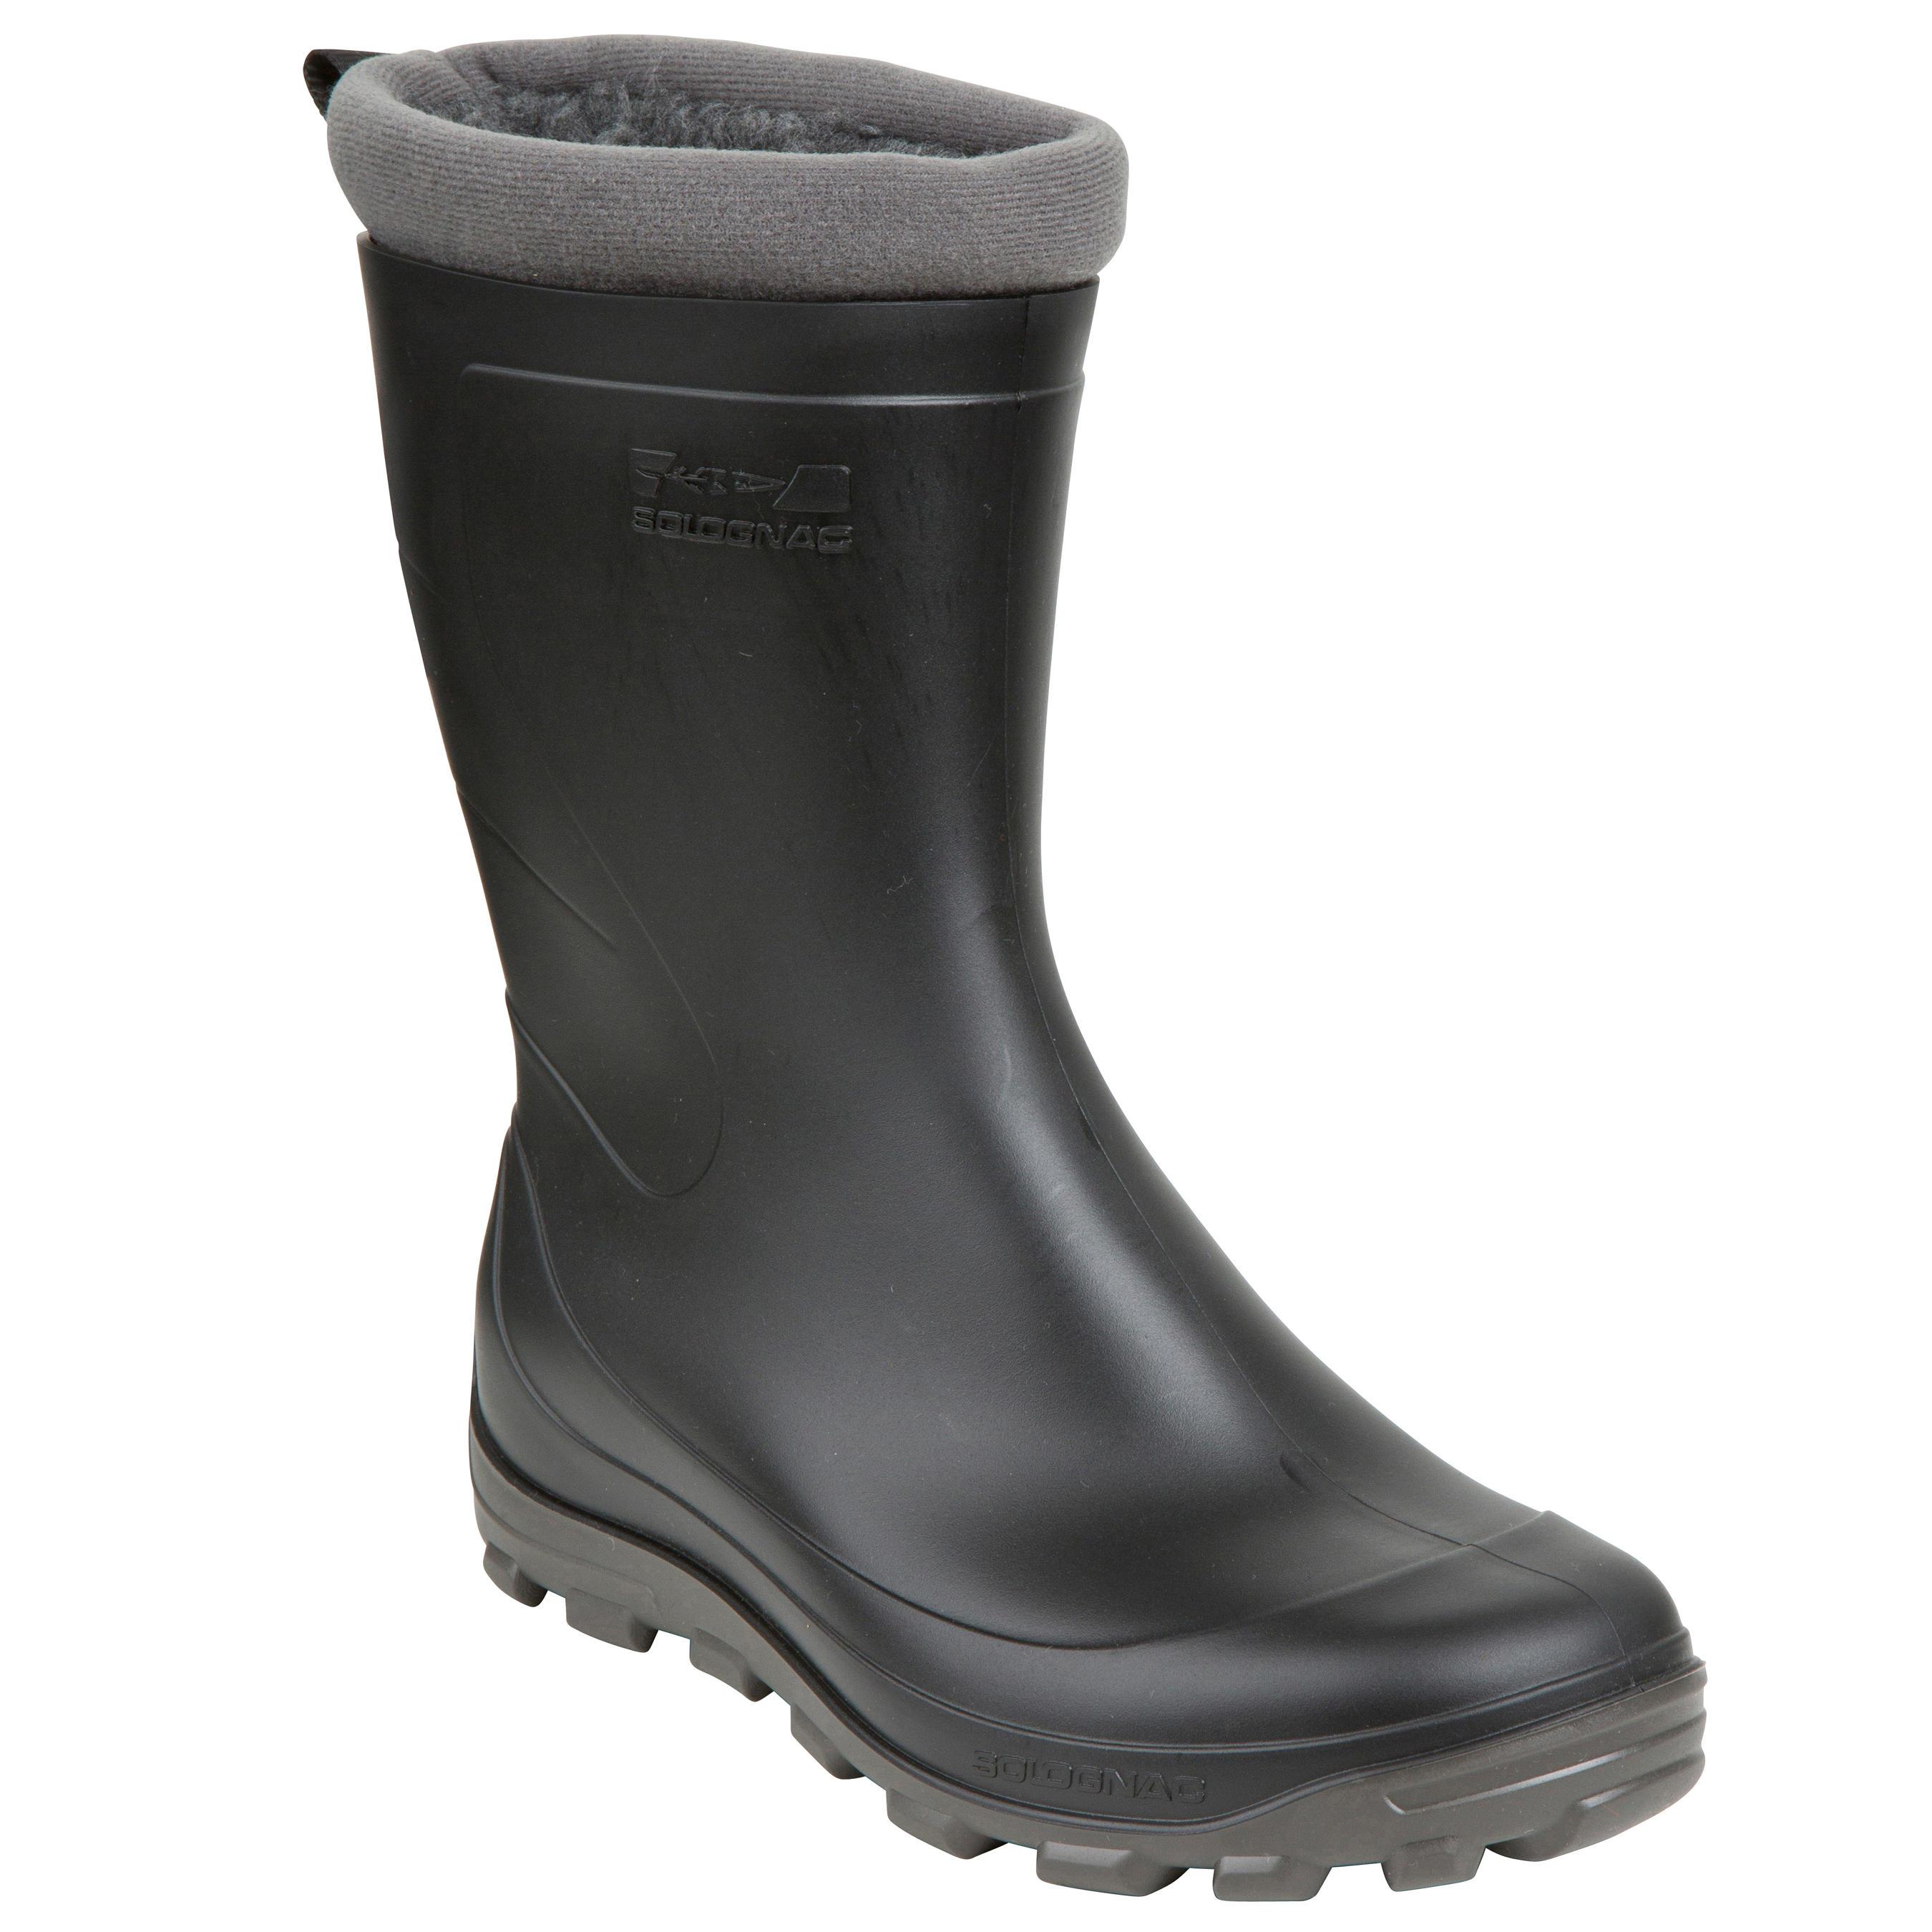 variedades anchas fabricación hábil pero no vulgar Comprar botas de agua para niños online | Decathlon